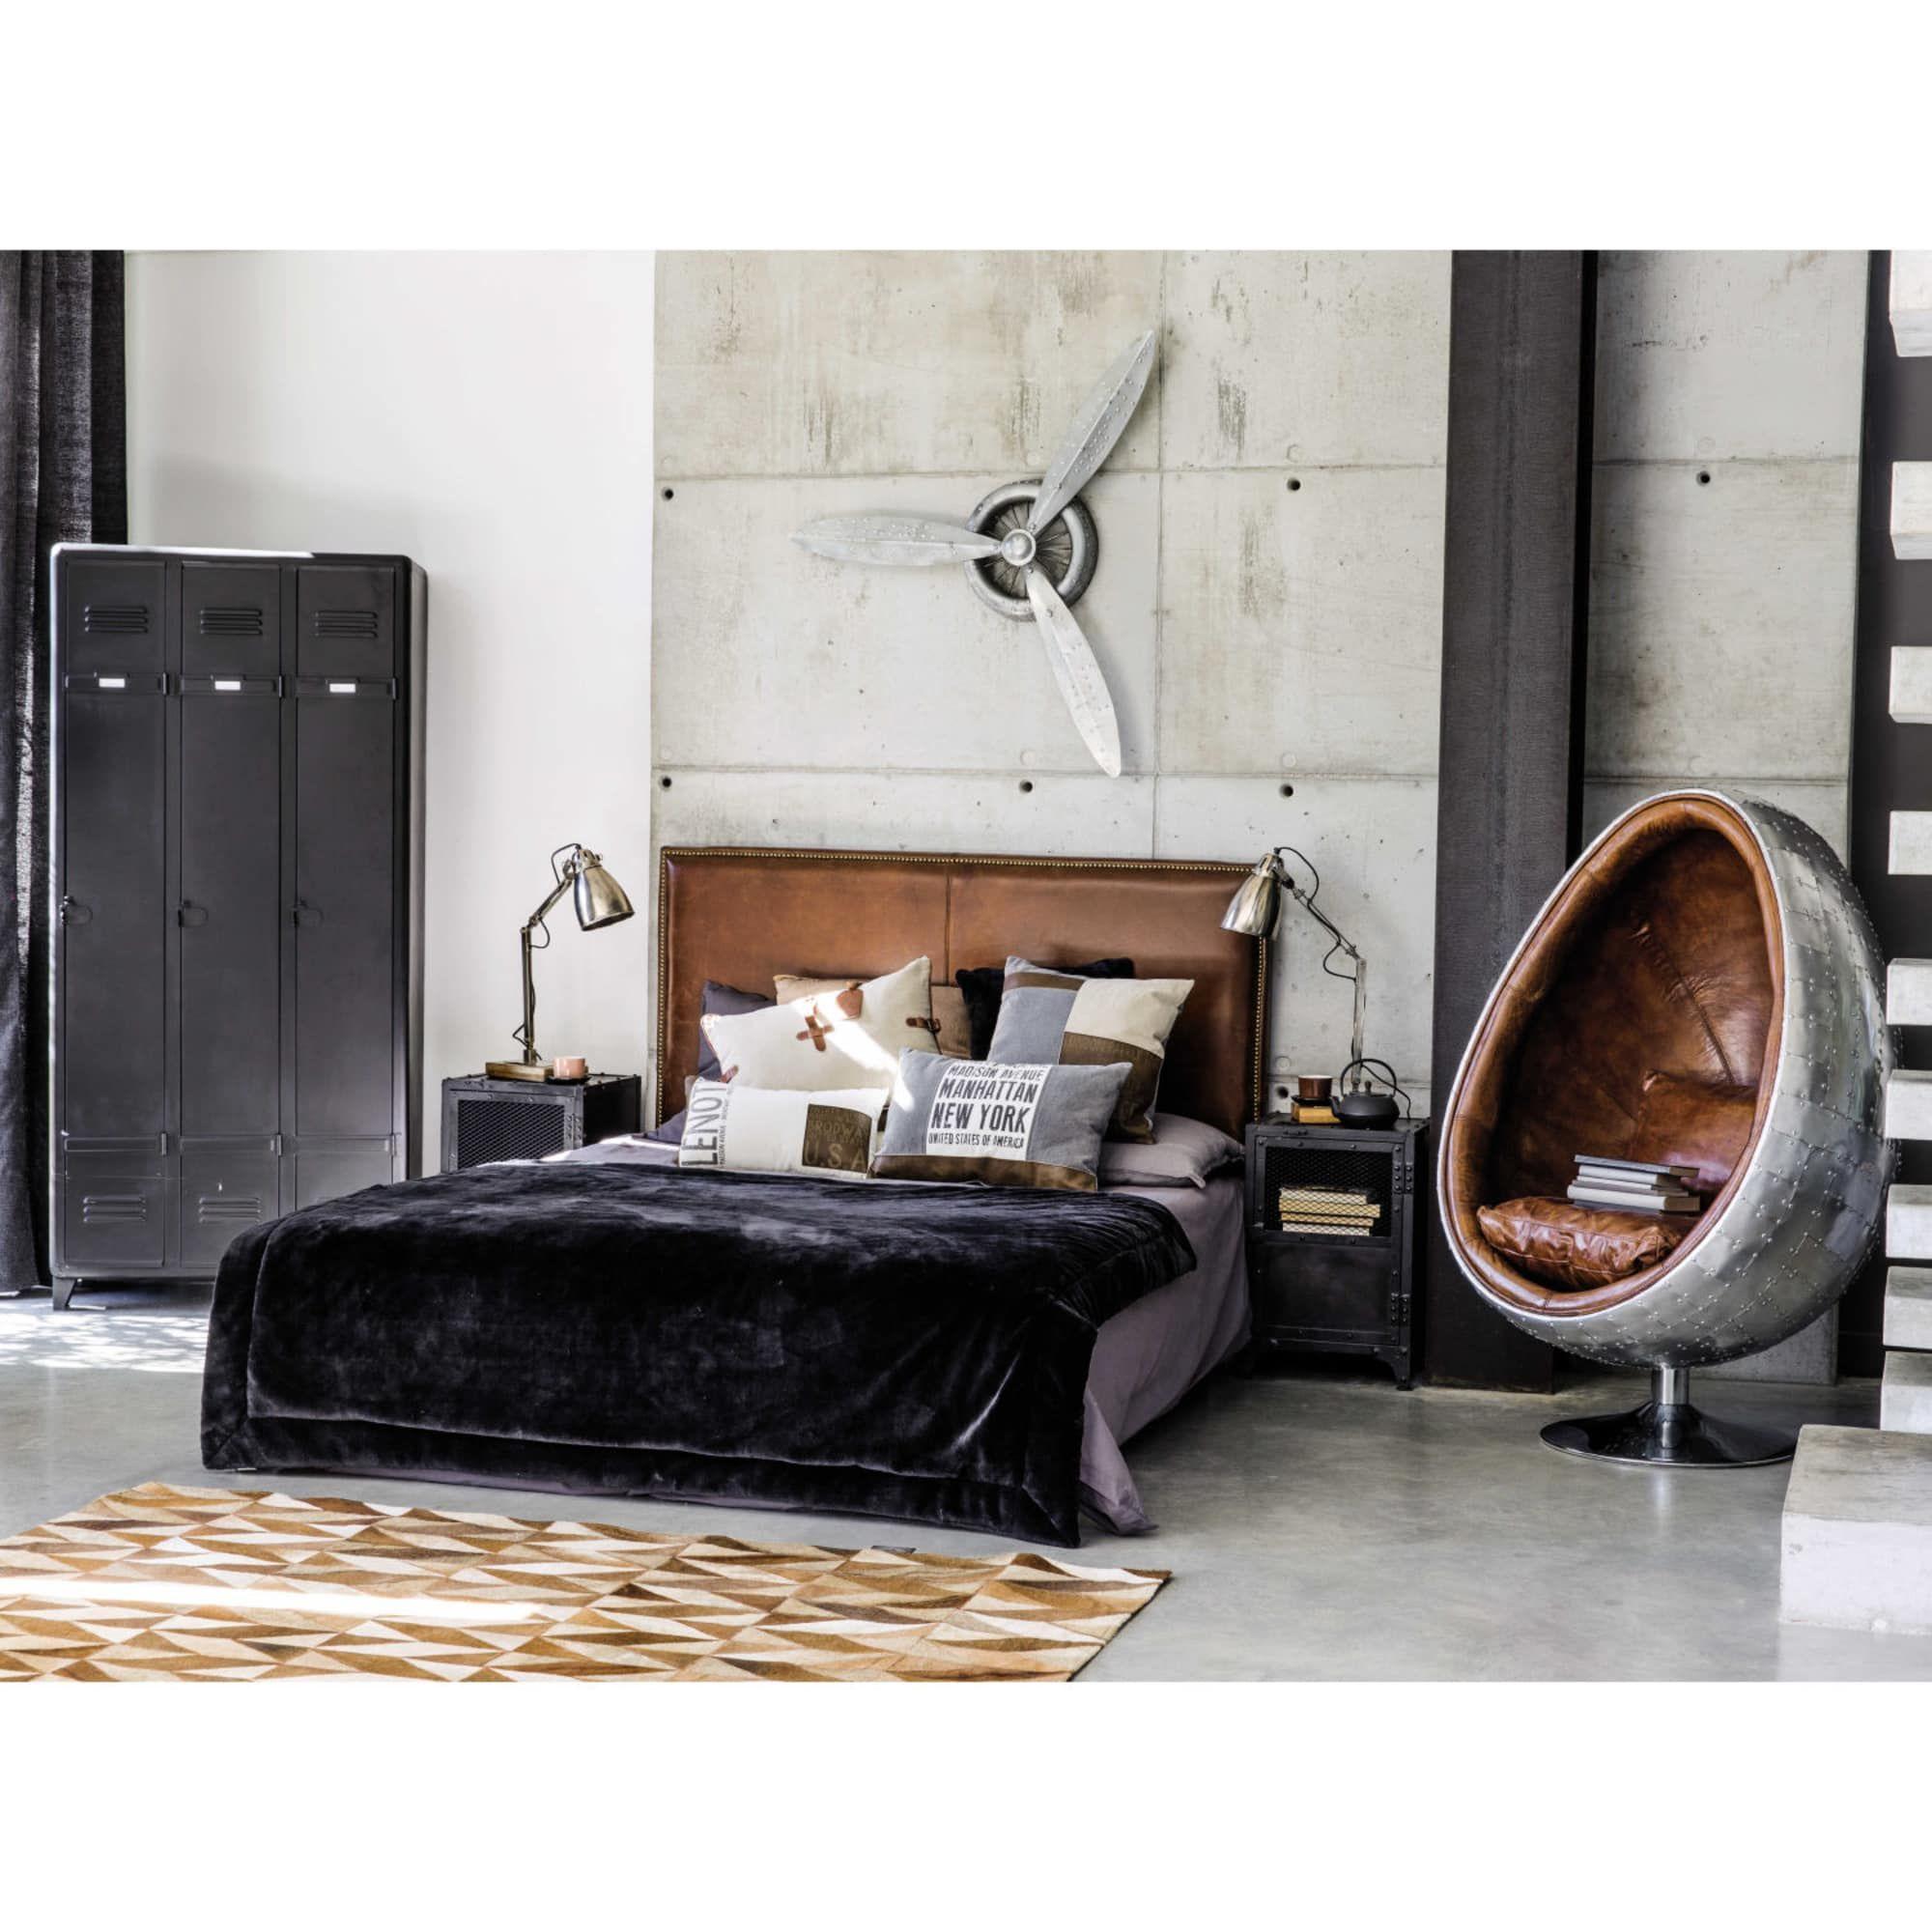 Helice Murale Aviation Vintage Industrial Decor Furniture Interior Design Bedroom